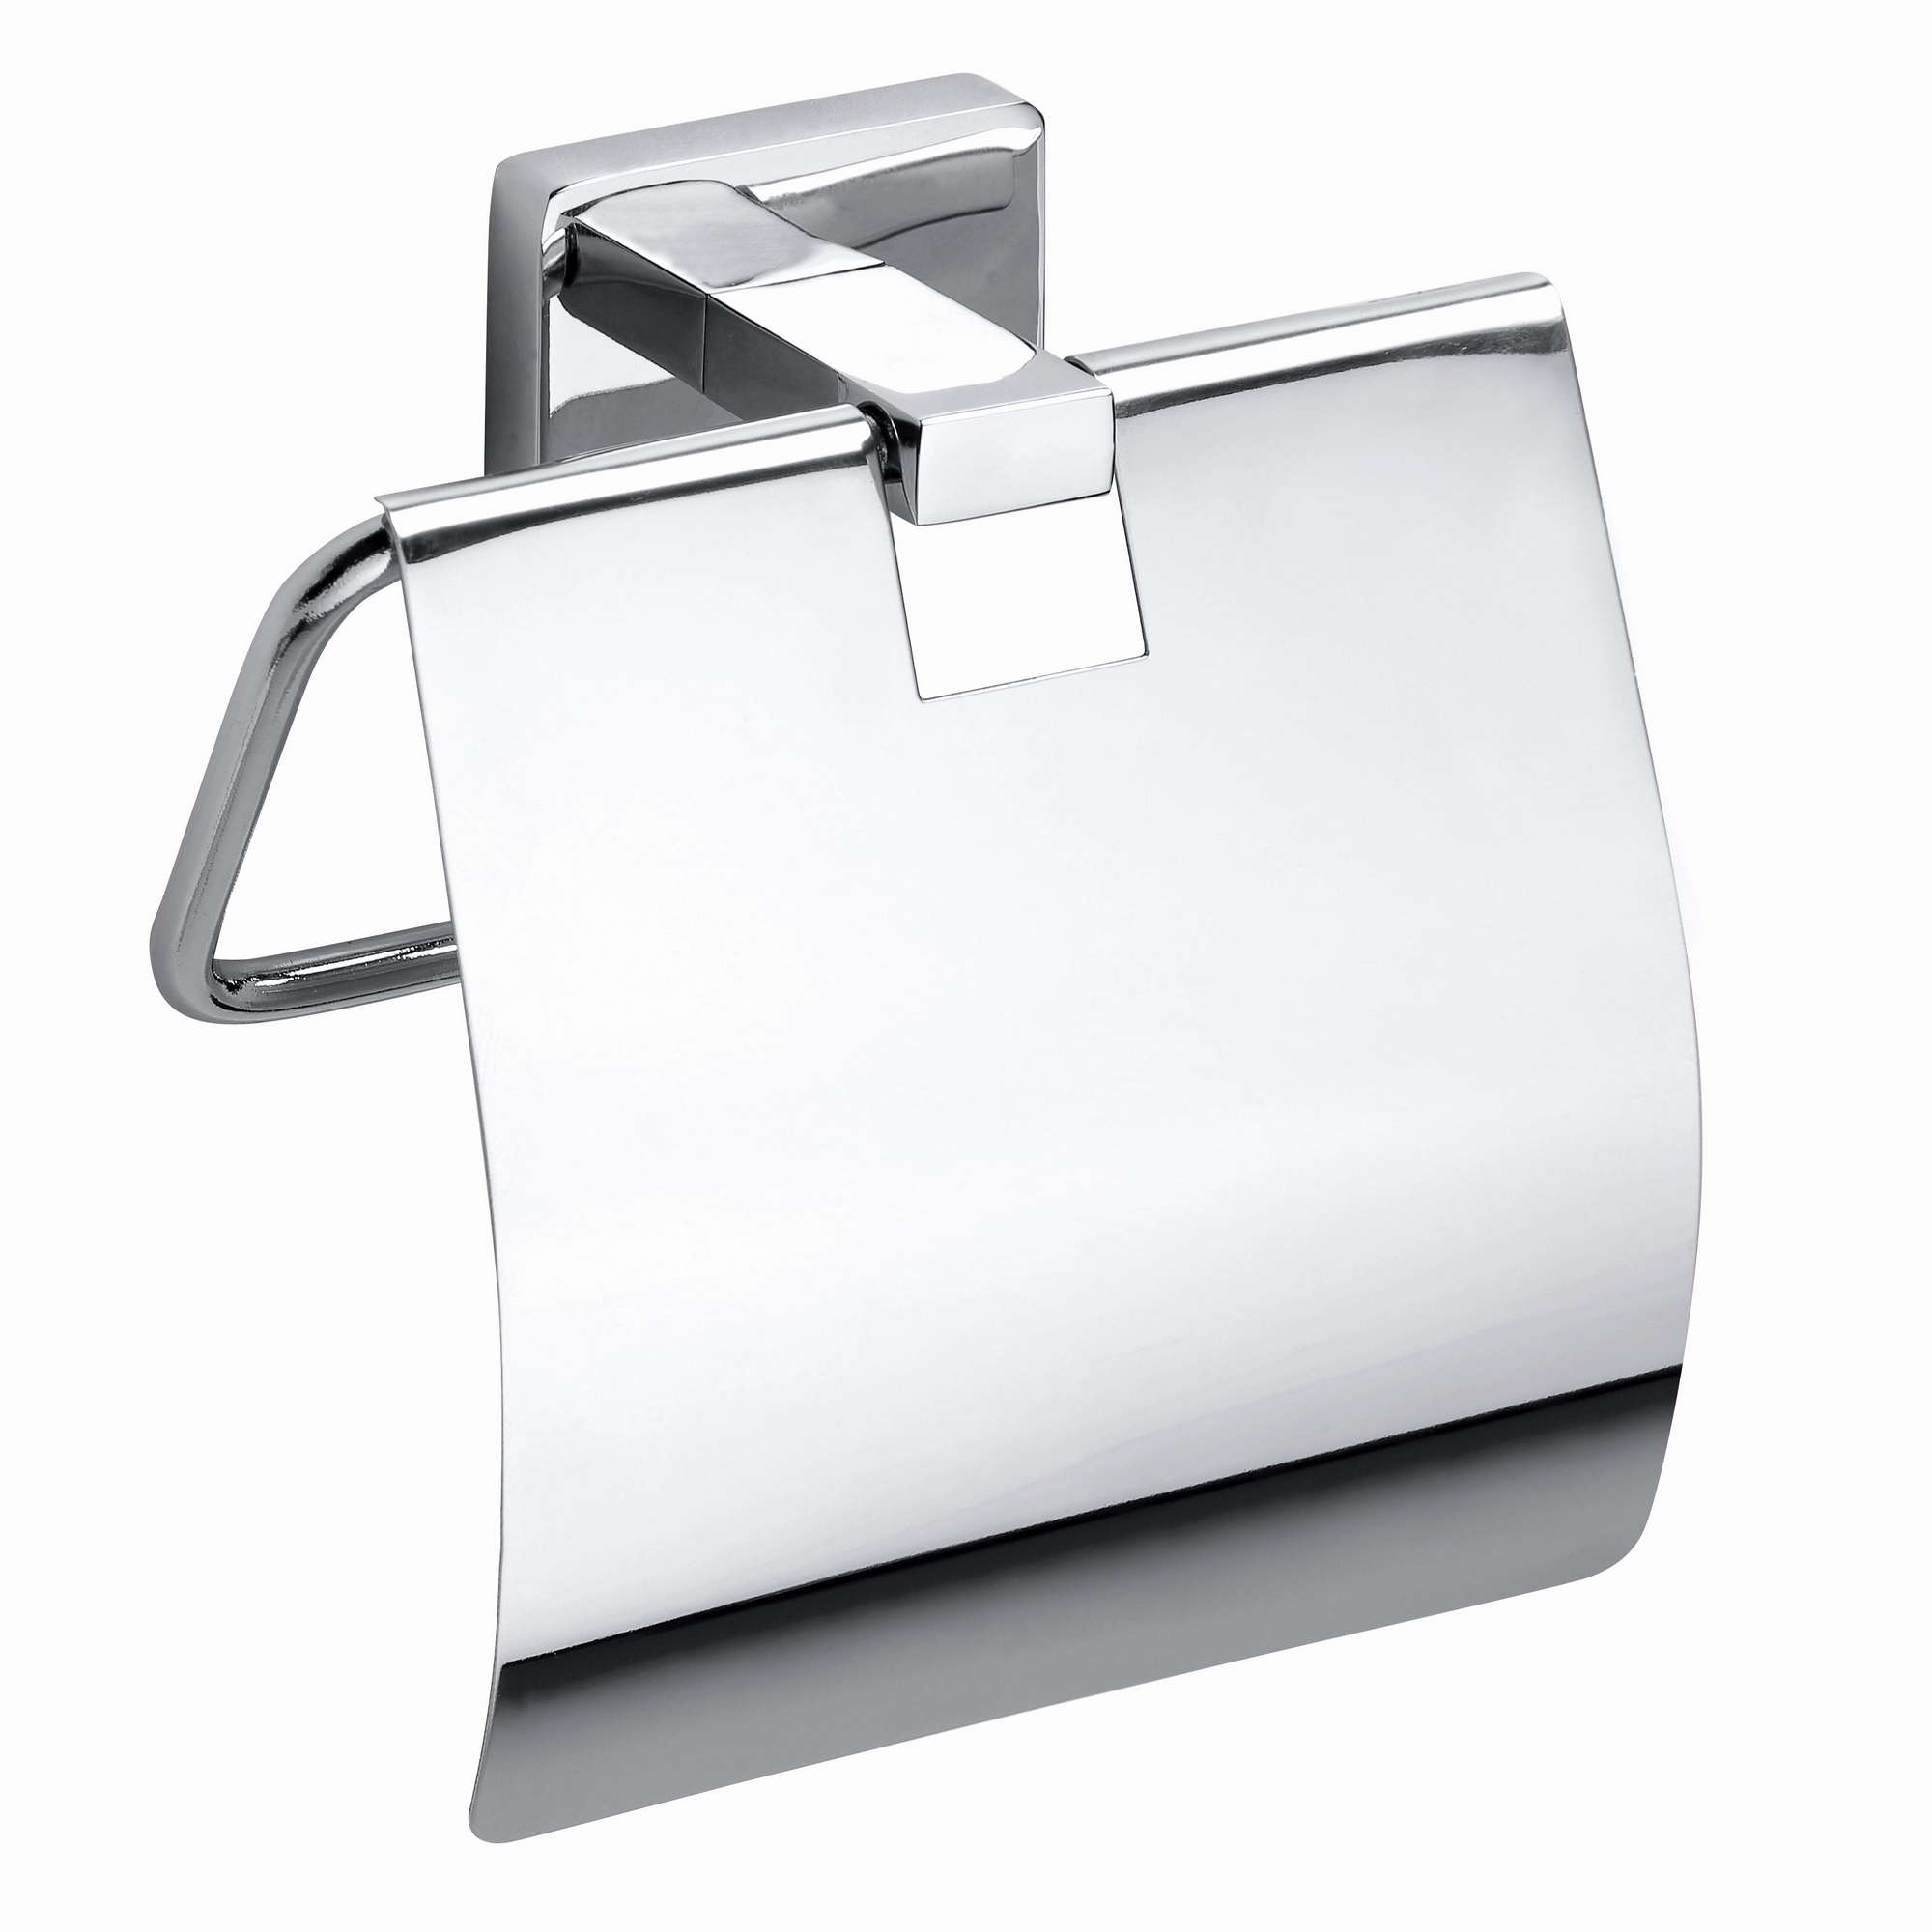 Toalettpappershållare Duschbyggarna Angle med Lock